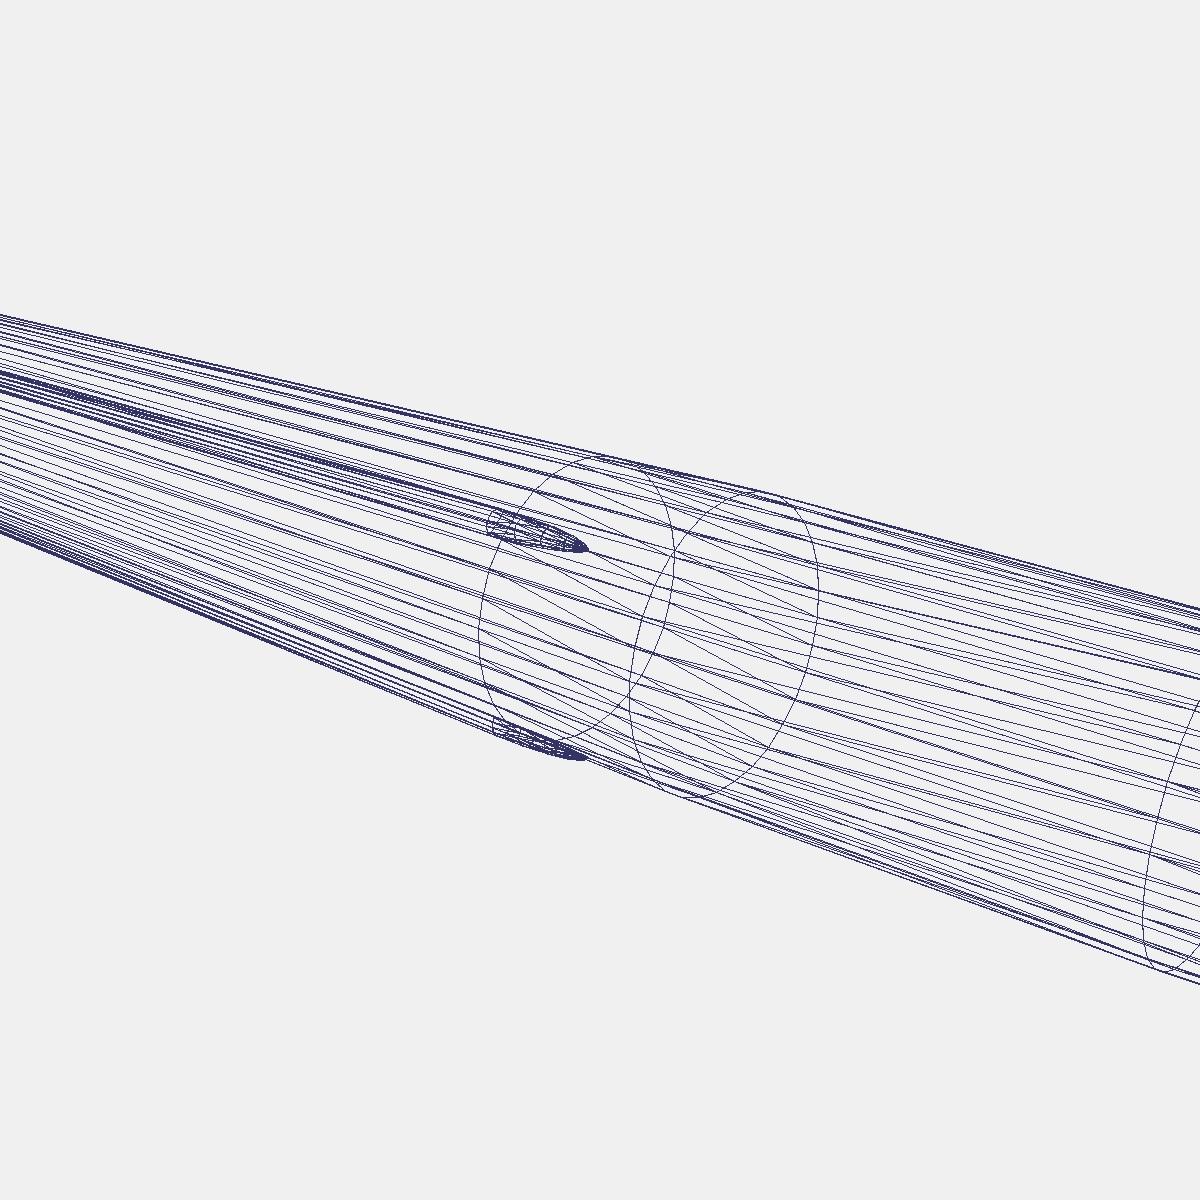 aerobee 170 rocket 3d model 3ds dxf fbx blend cob dae x  obj 166050